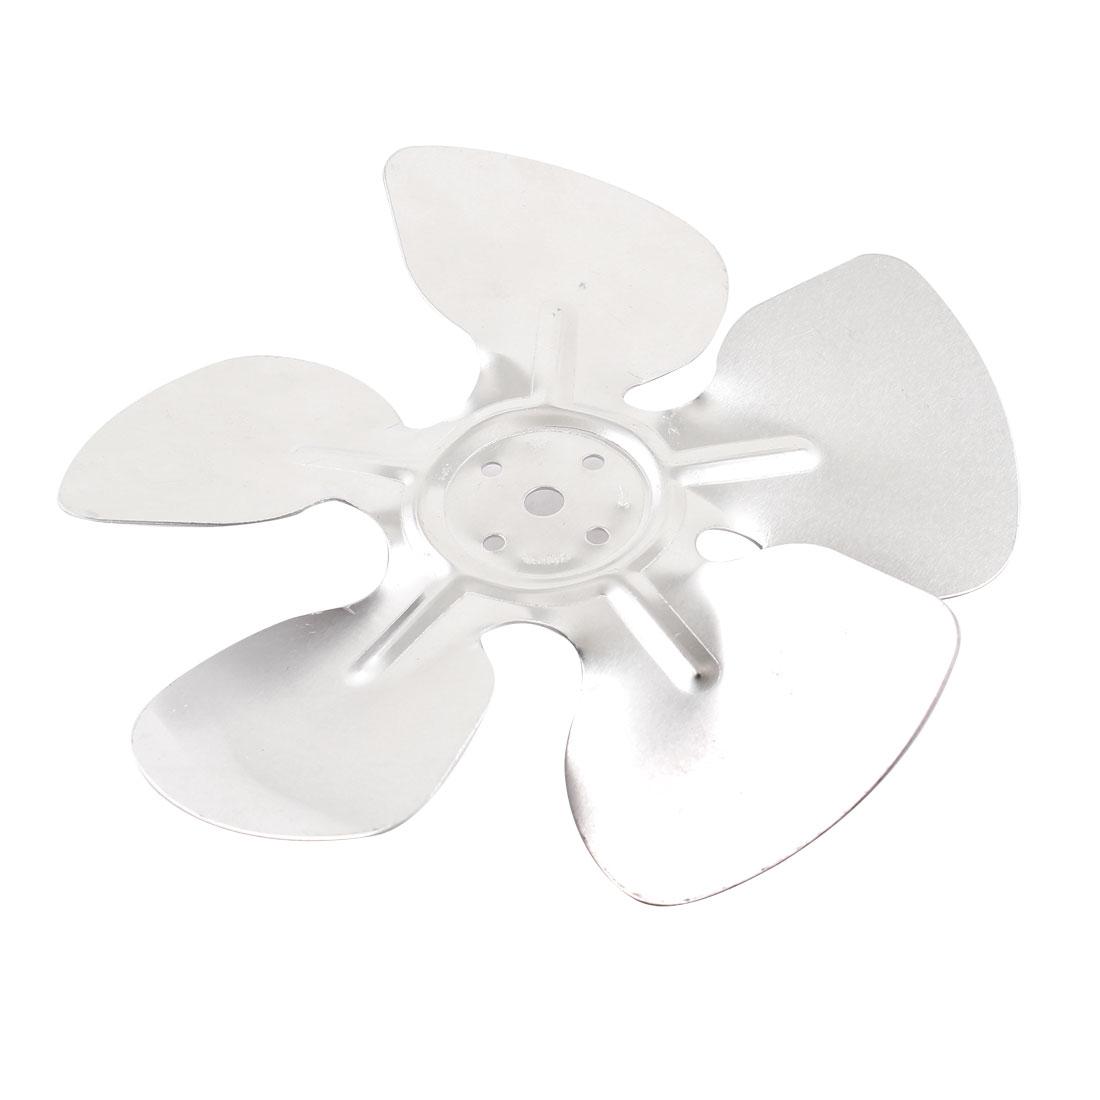 Home Plant Ventilator Exaust Motor Fan Vanes Silver Tone 17cm Diameter